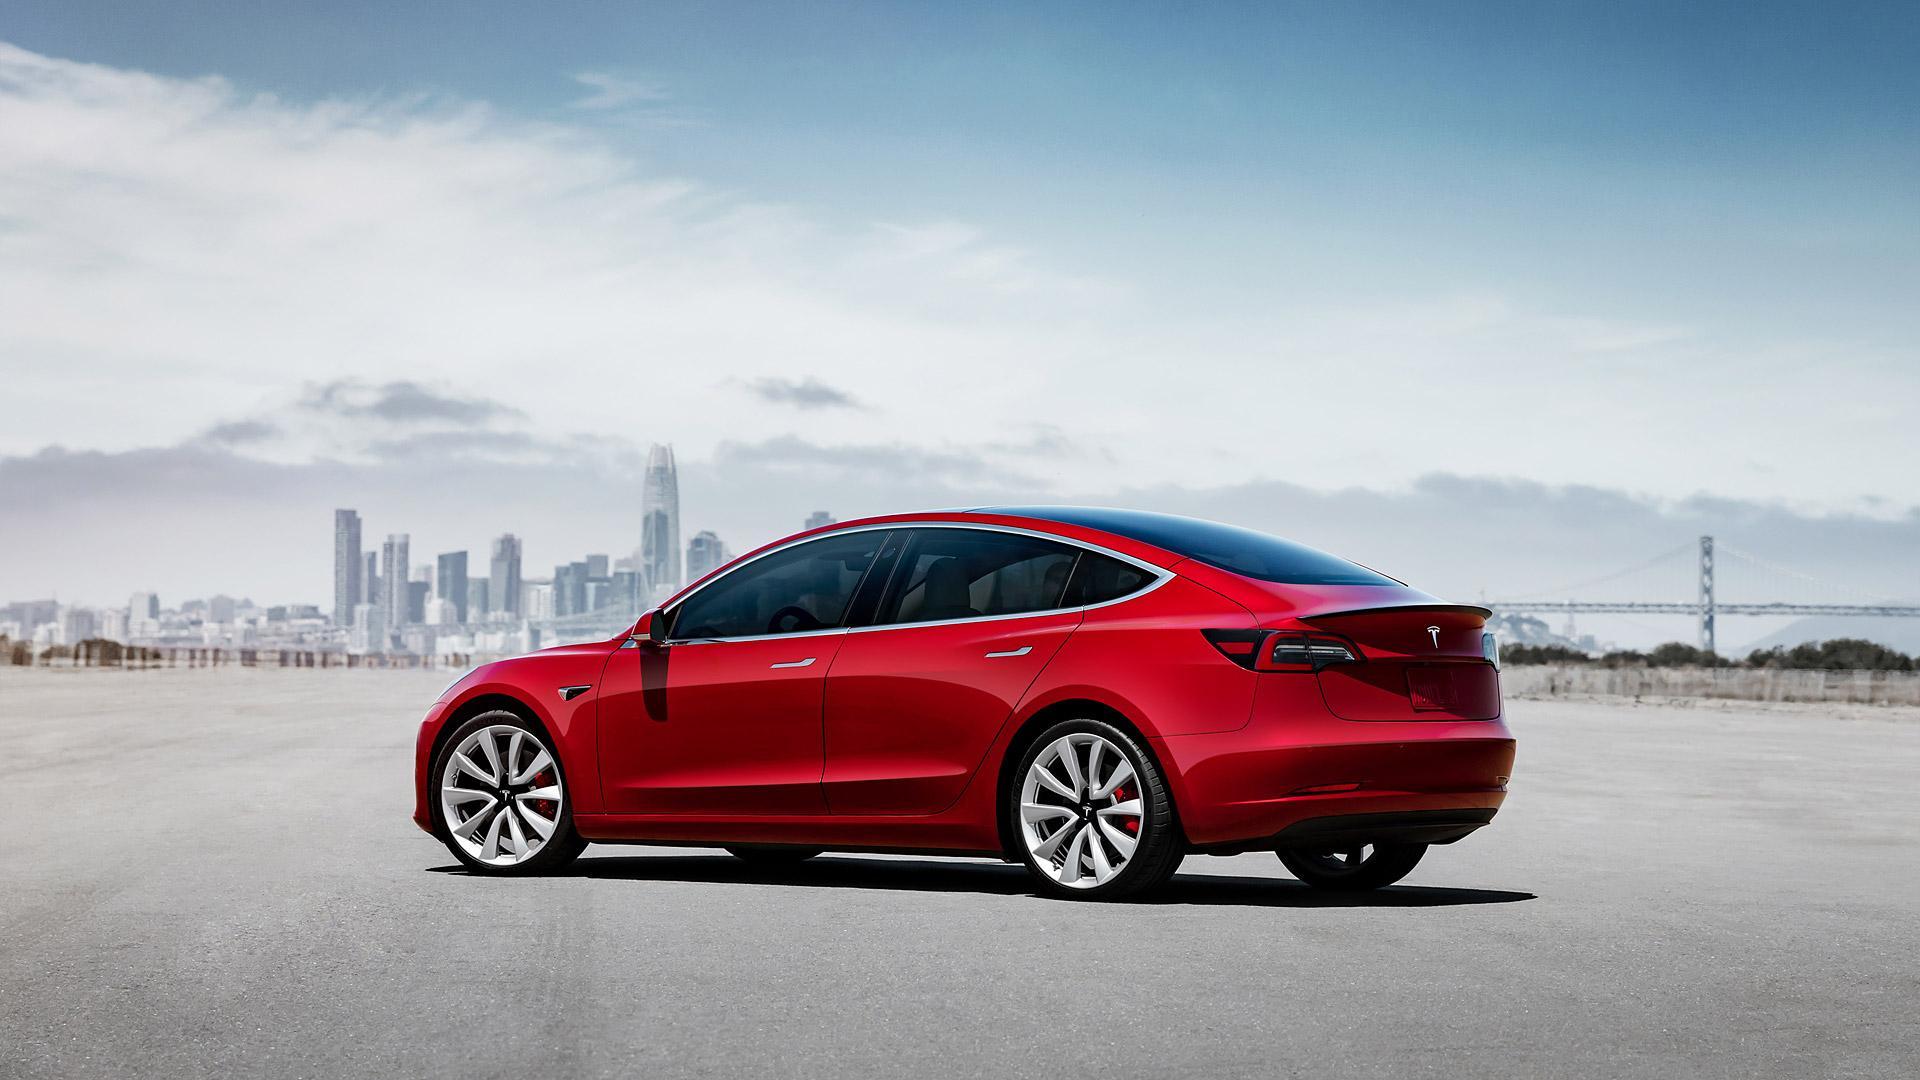 Tesla Model 3 Wallpapers Wallpaper Cave